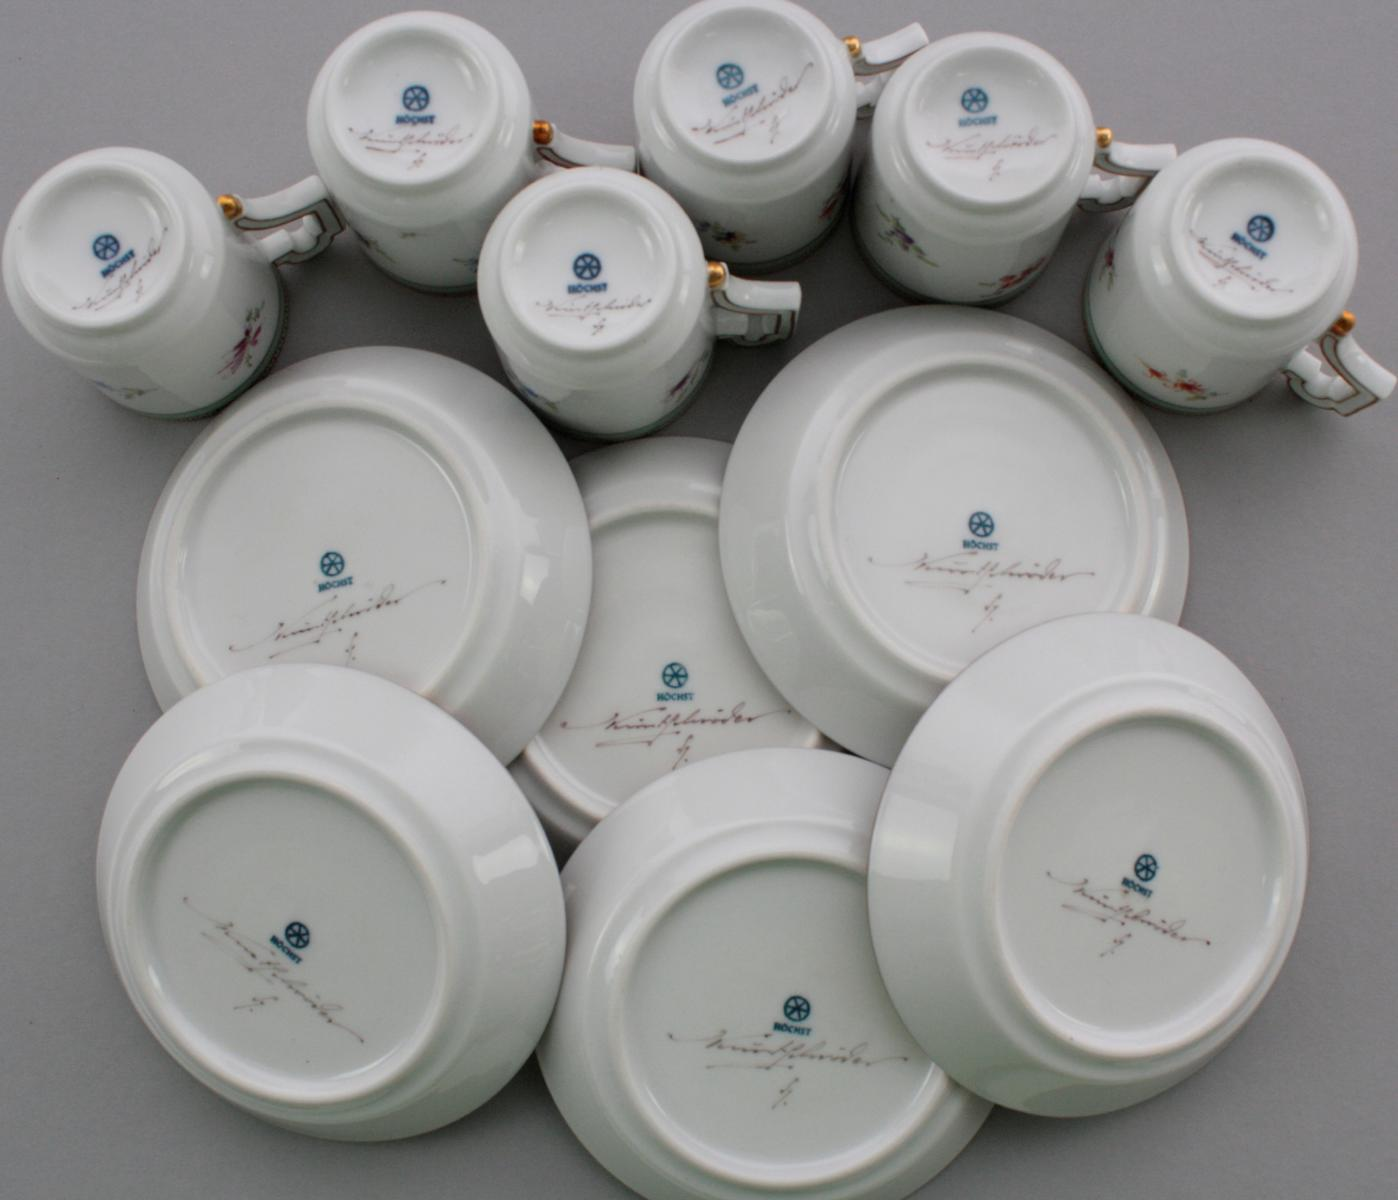 6 Mokkatassen, Form Kurfürst, Höchster Porzellanmanufaktur-2